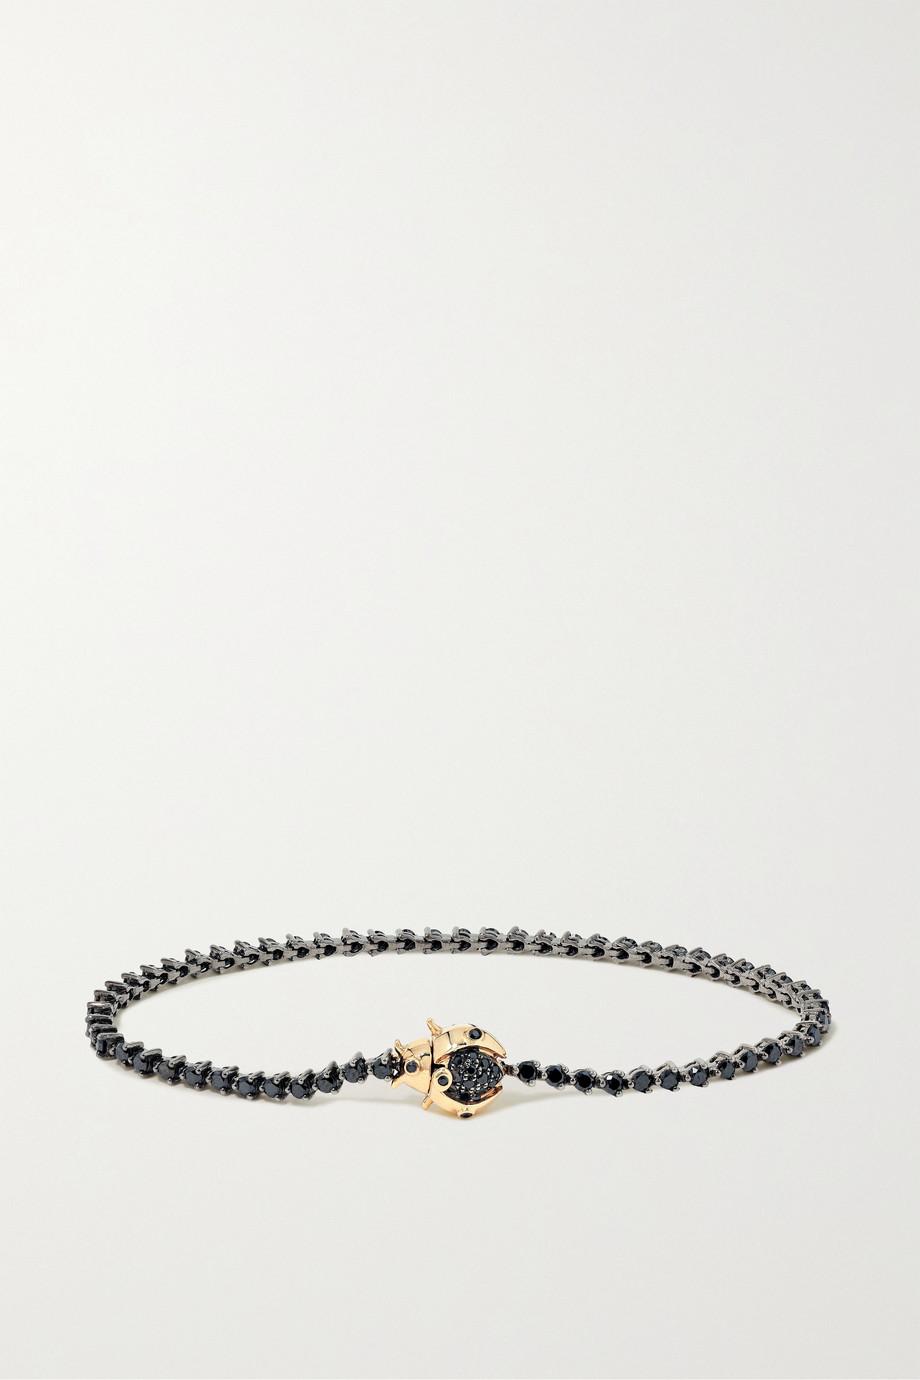 Yvonne Léon 18-karat blackened white and yellow gold diamond bracelet